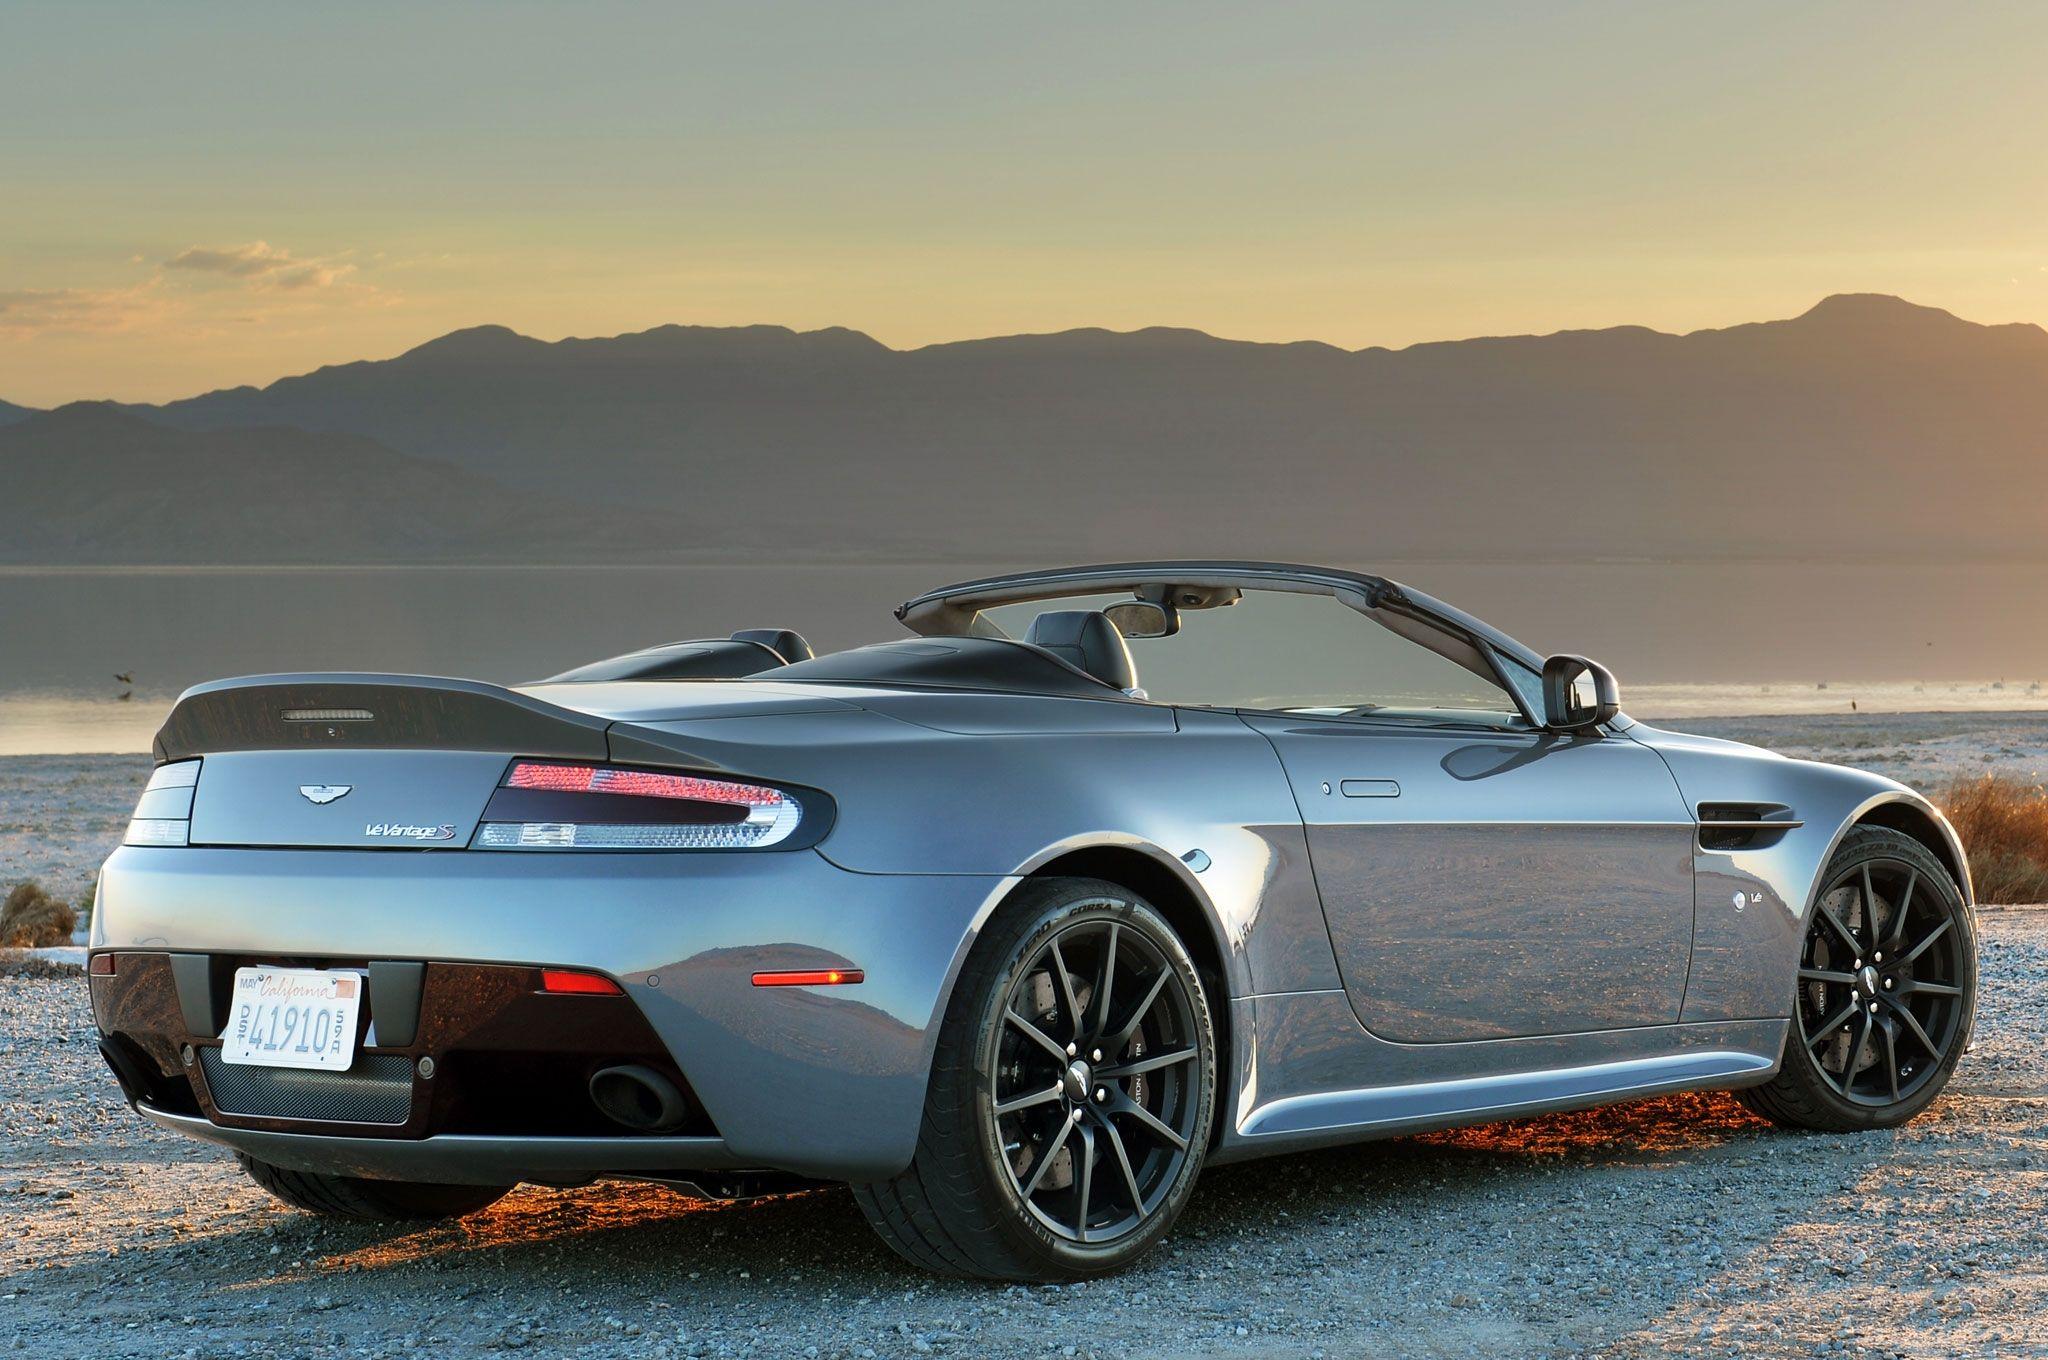 2015 Aston Martin V8 Vantage S Roadster Rediseño Detalles